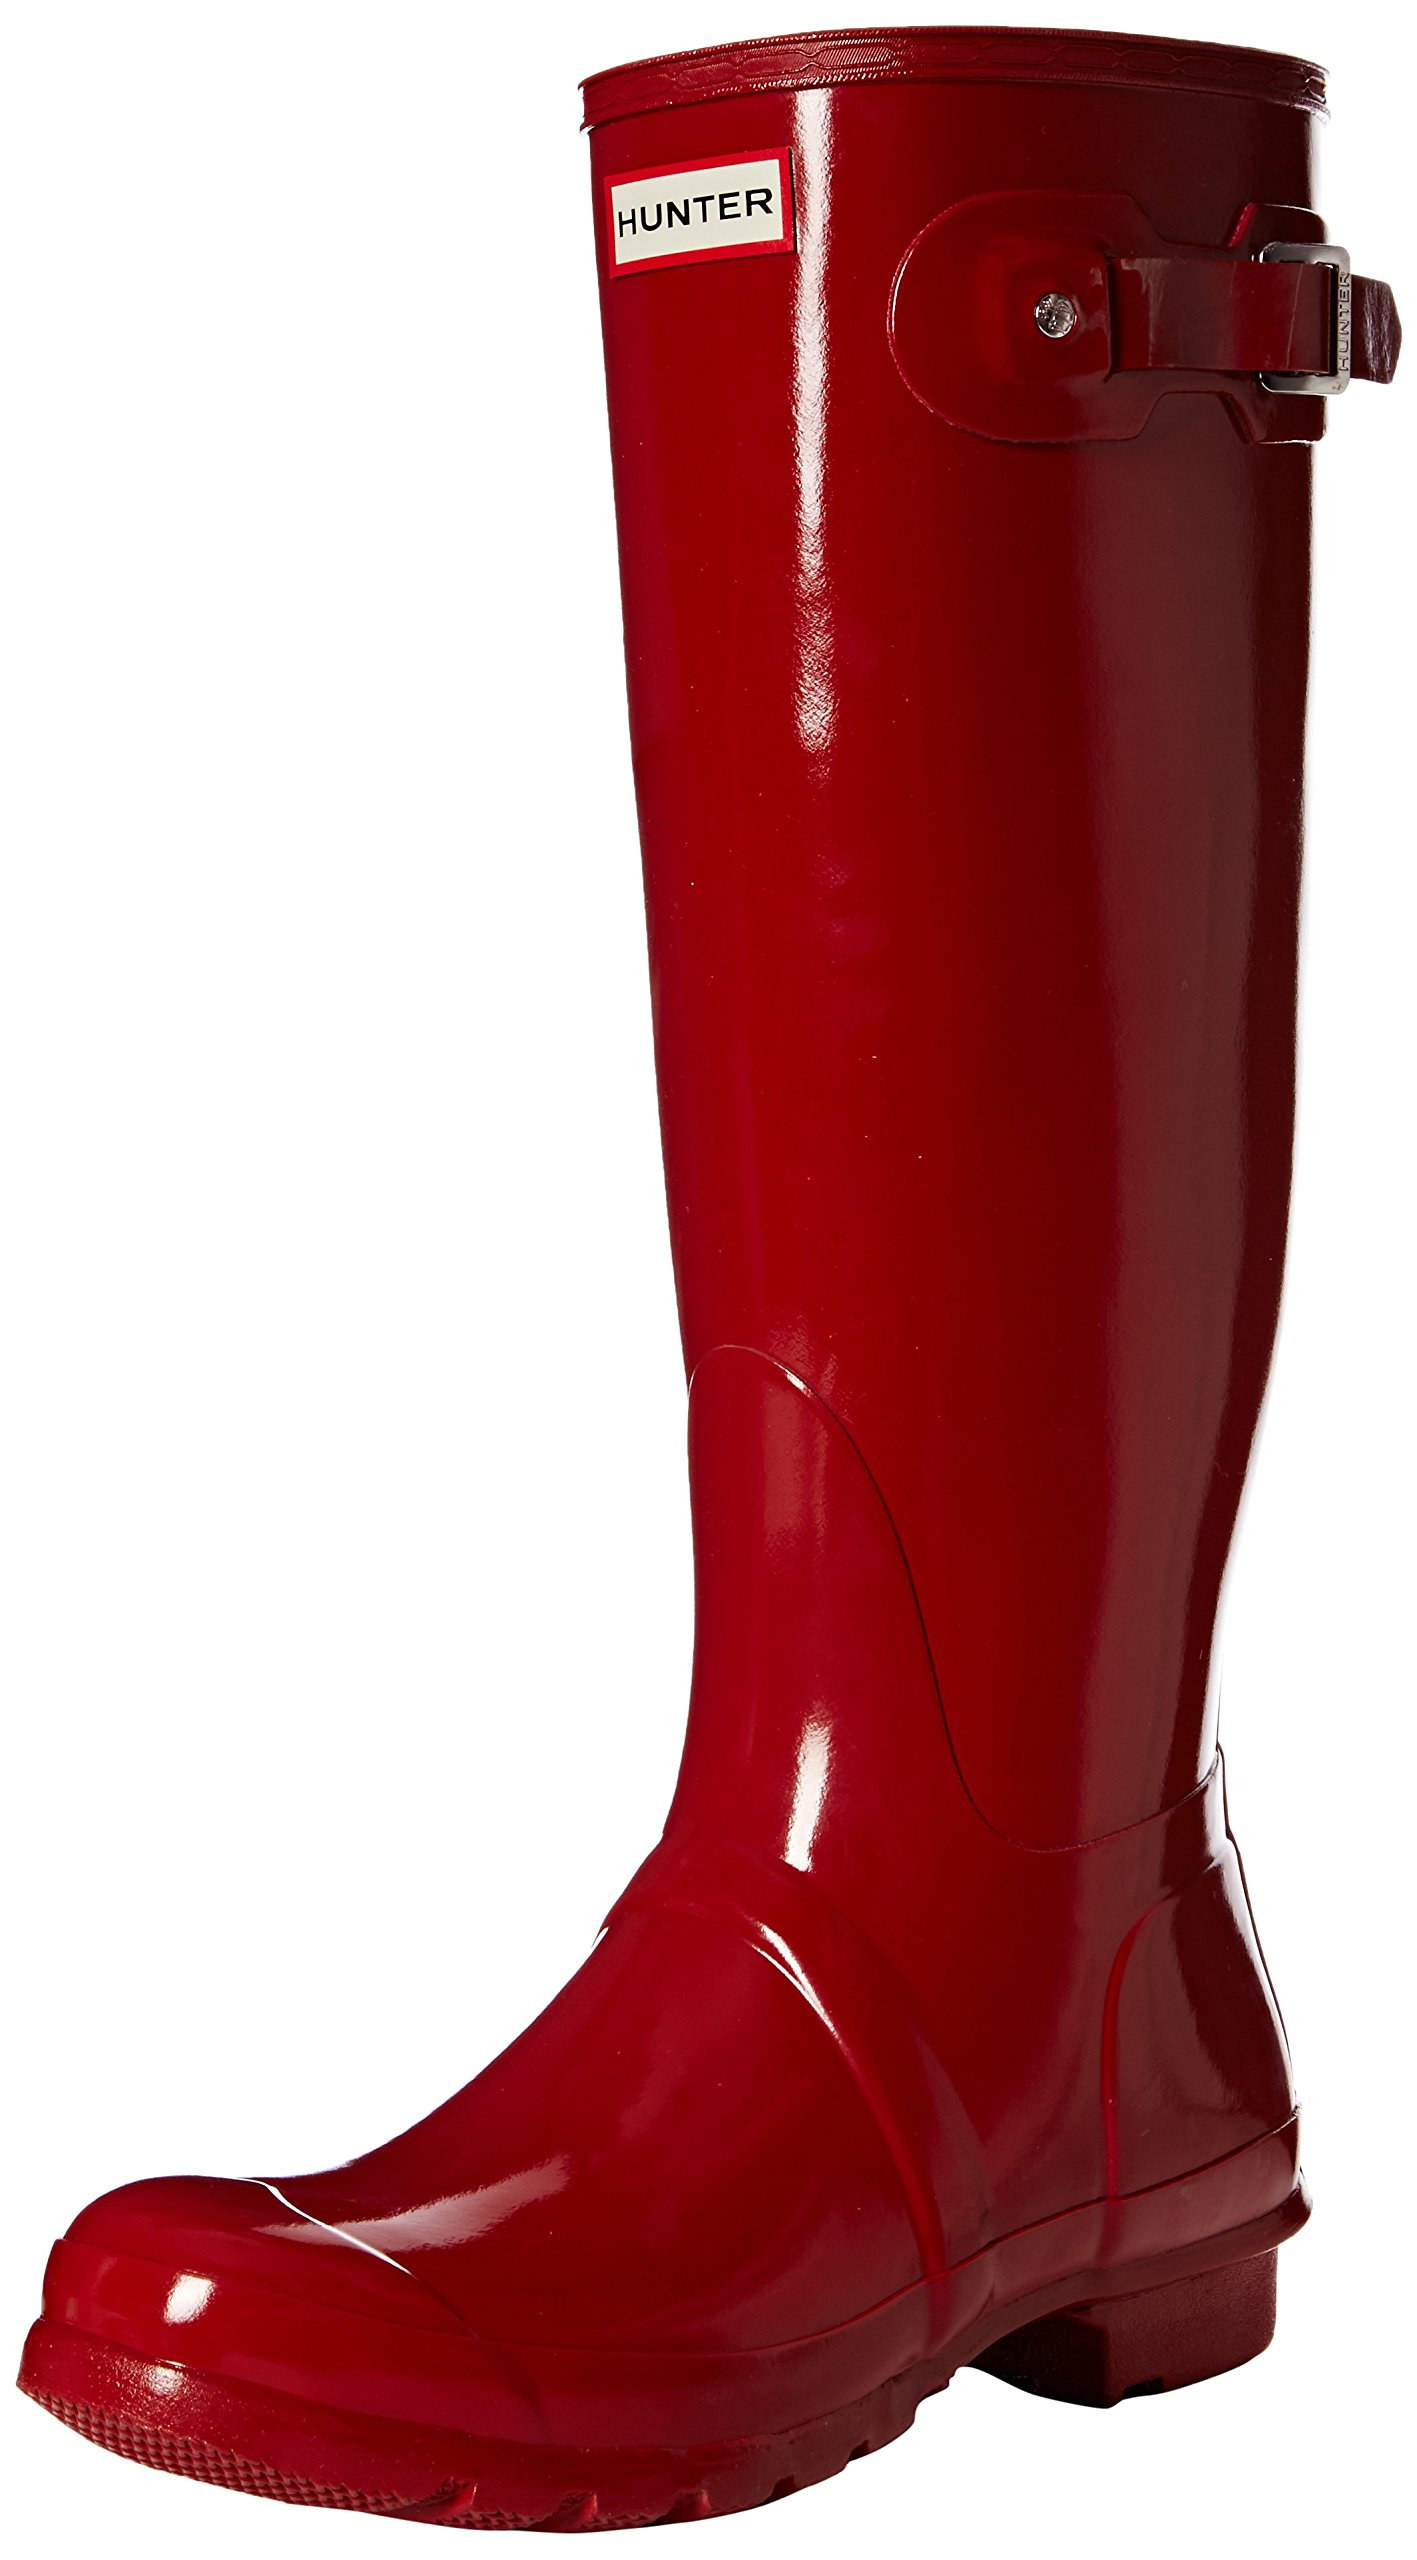 Hunter Women's Original Tall Rain Boot,Military Red,10 B(M) US